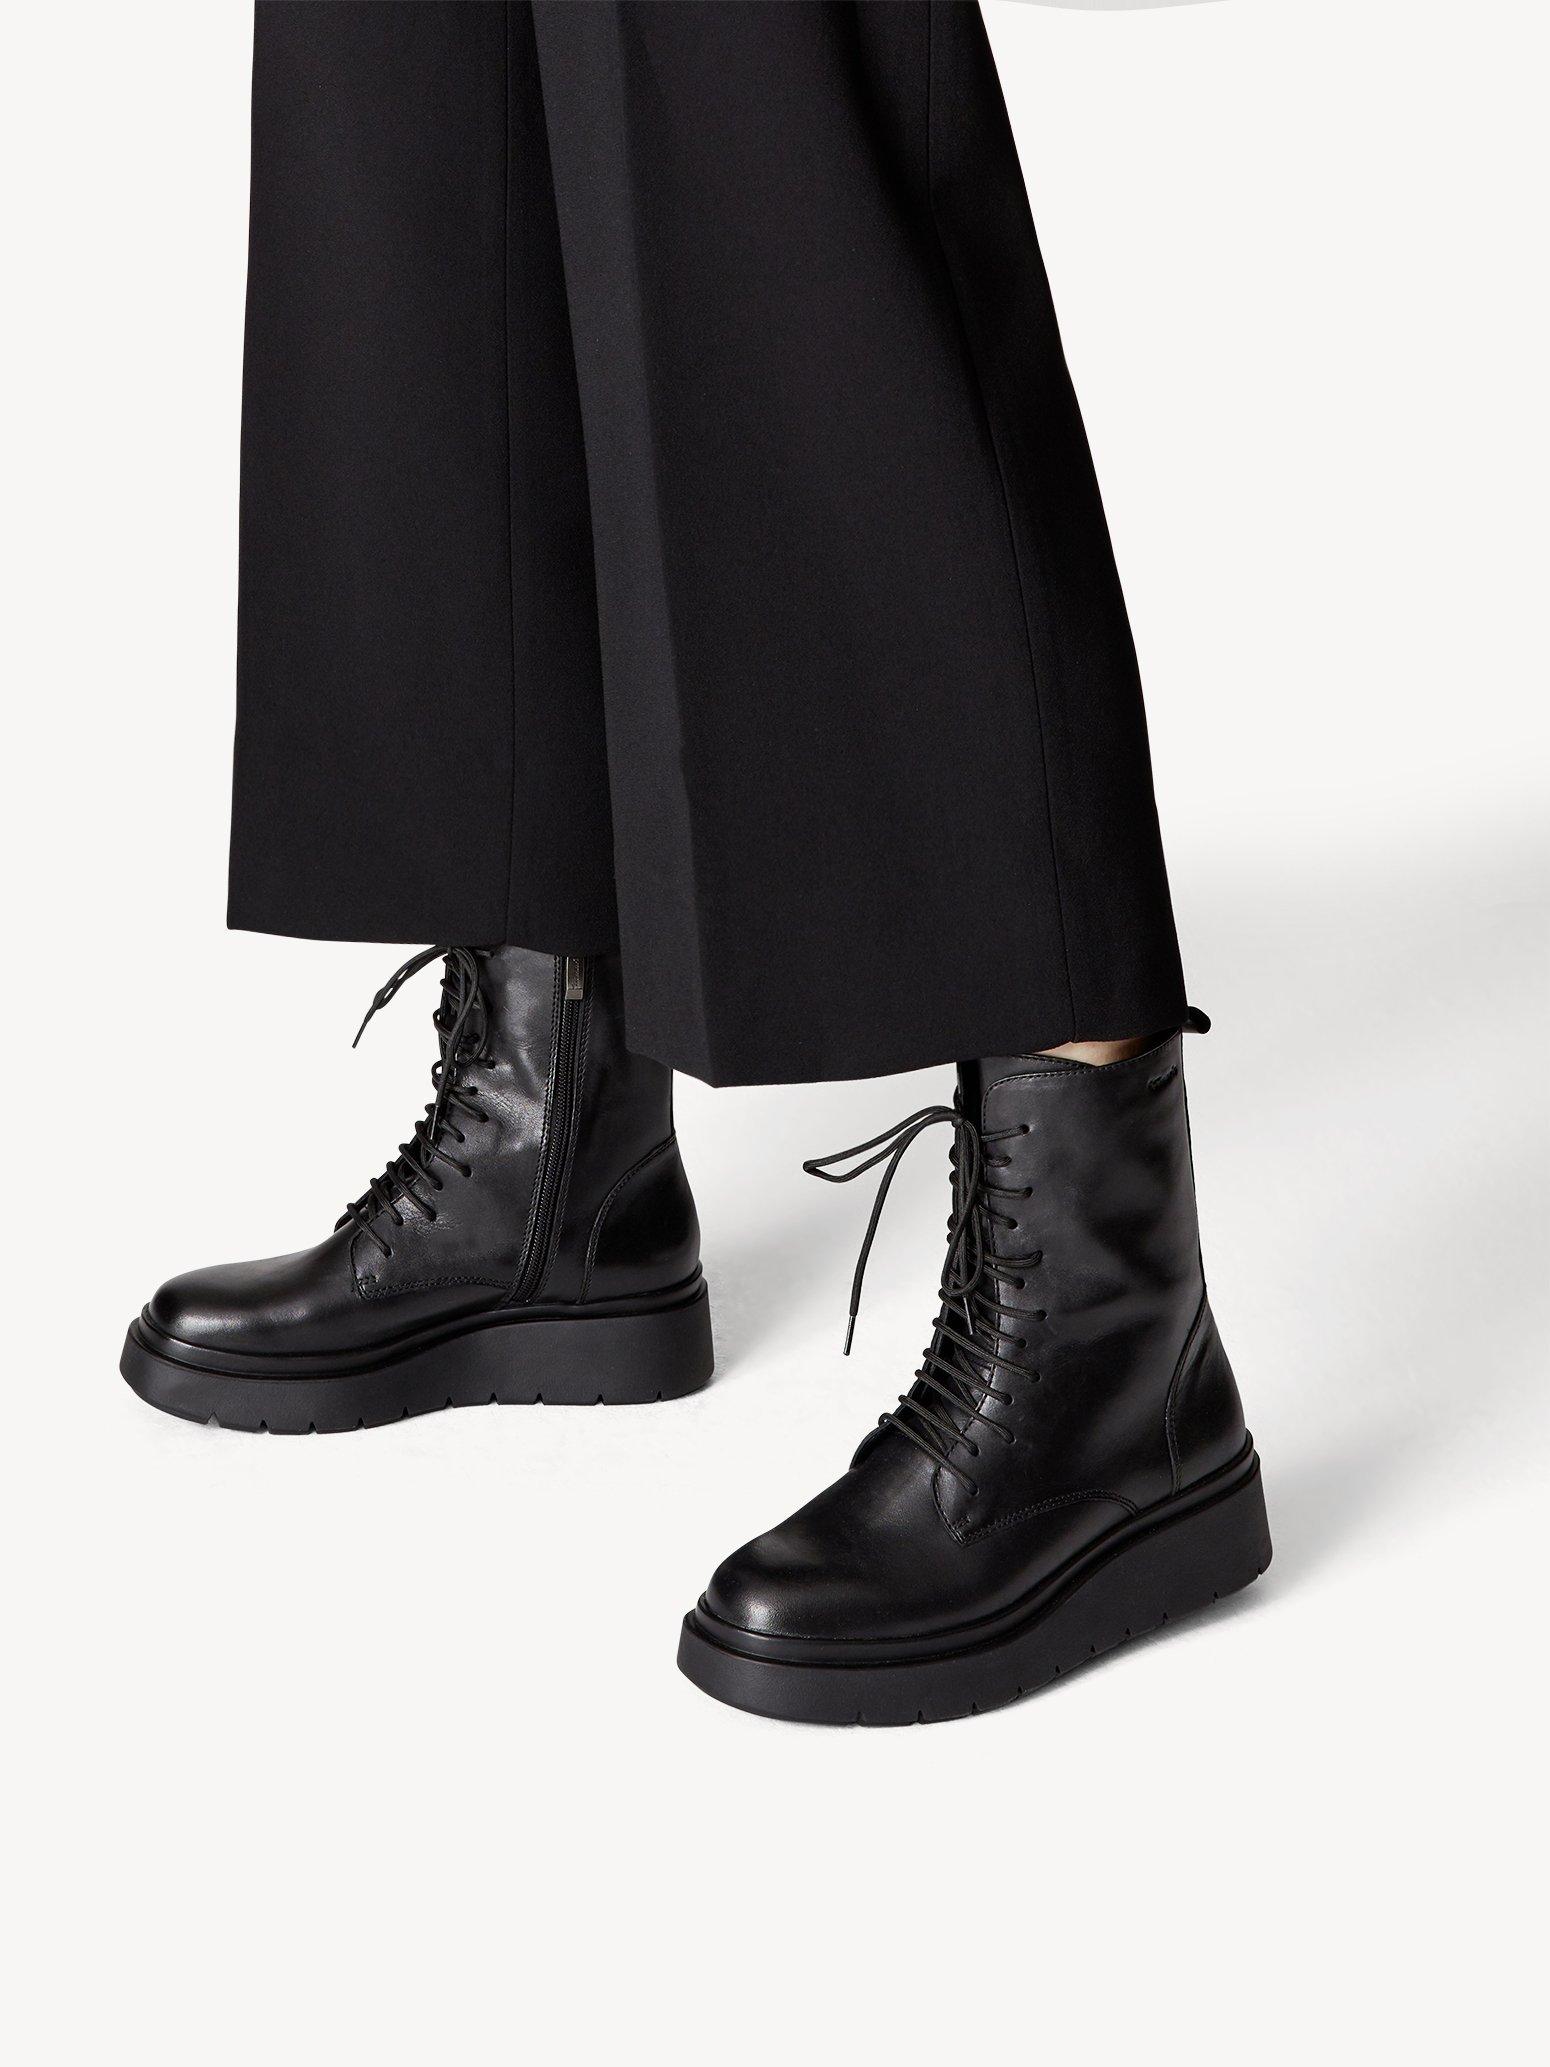 Ботинки Tamaris 1-1-25811-27-001